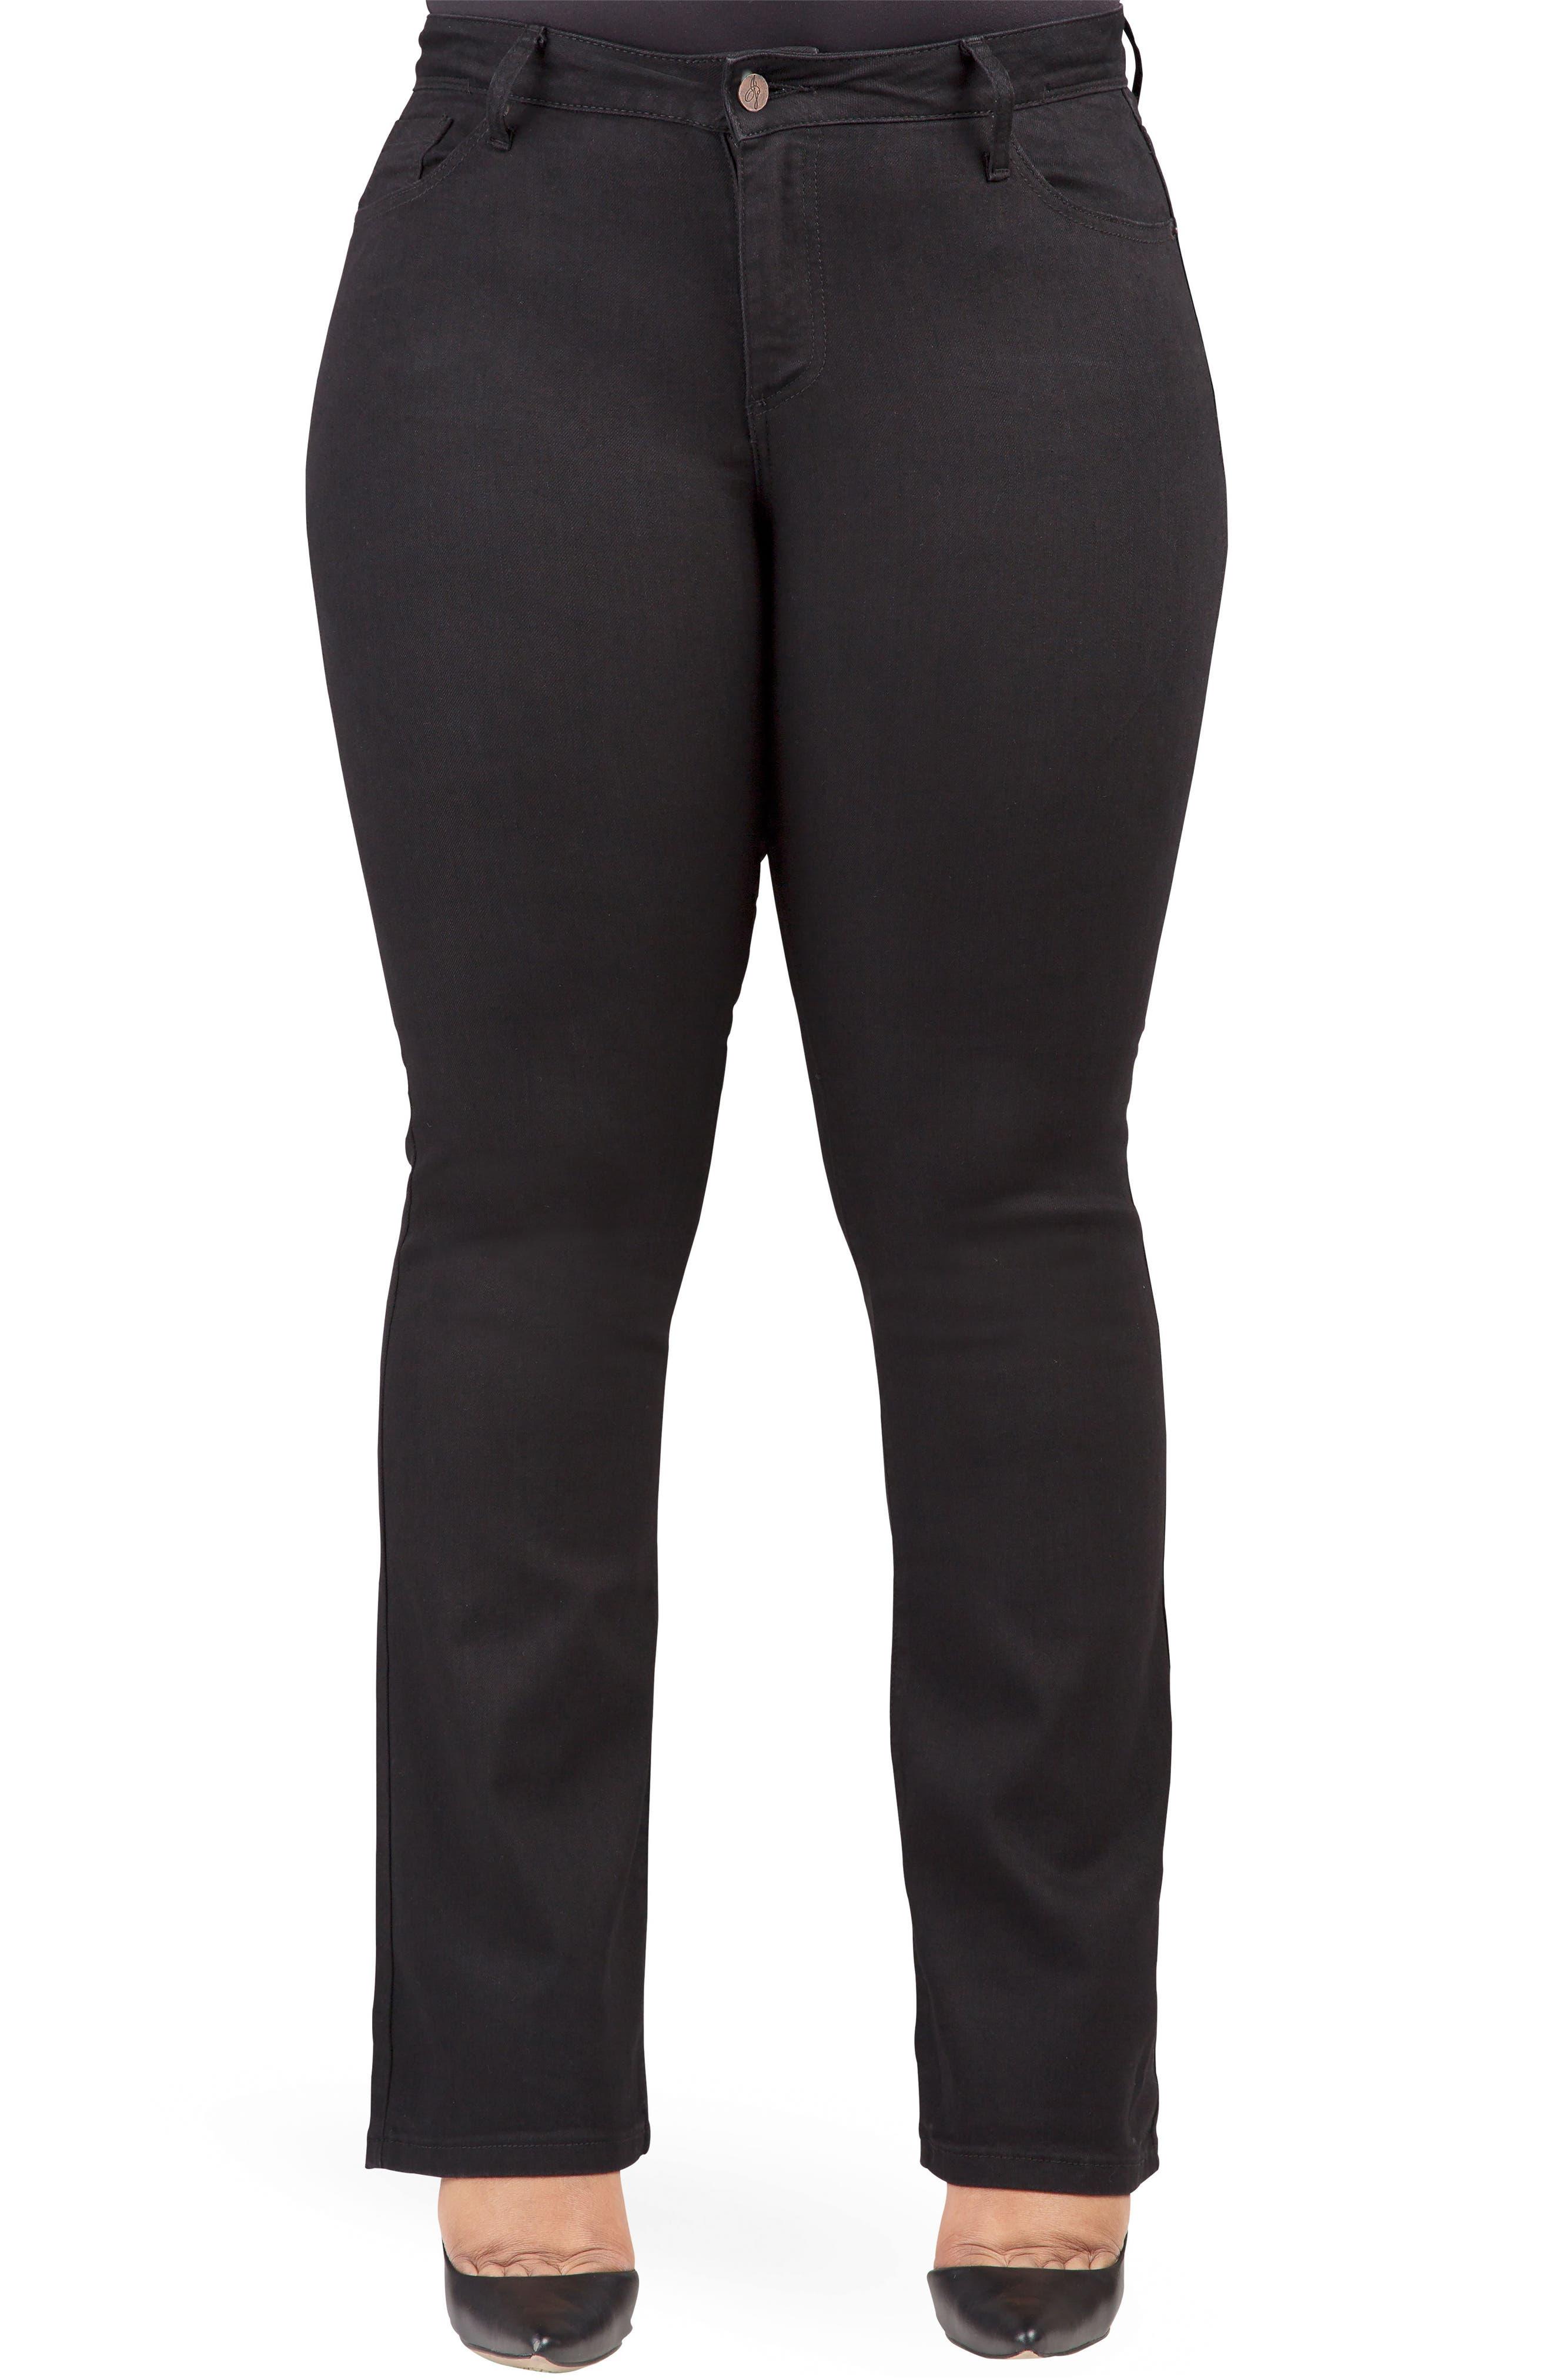 Poetic Justice Scarlett Slim Bootcut Curvy Fit Jeans (Plus Size)